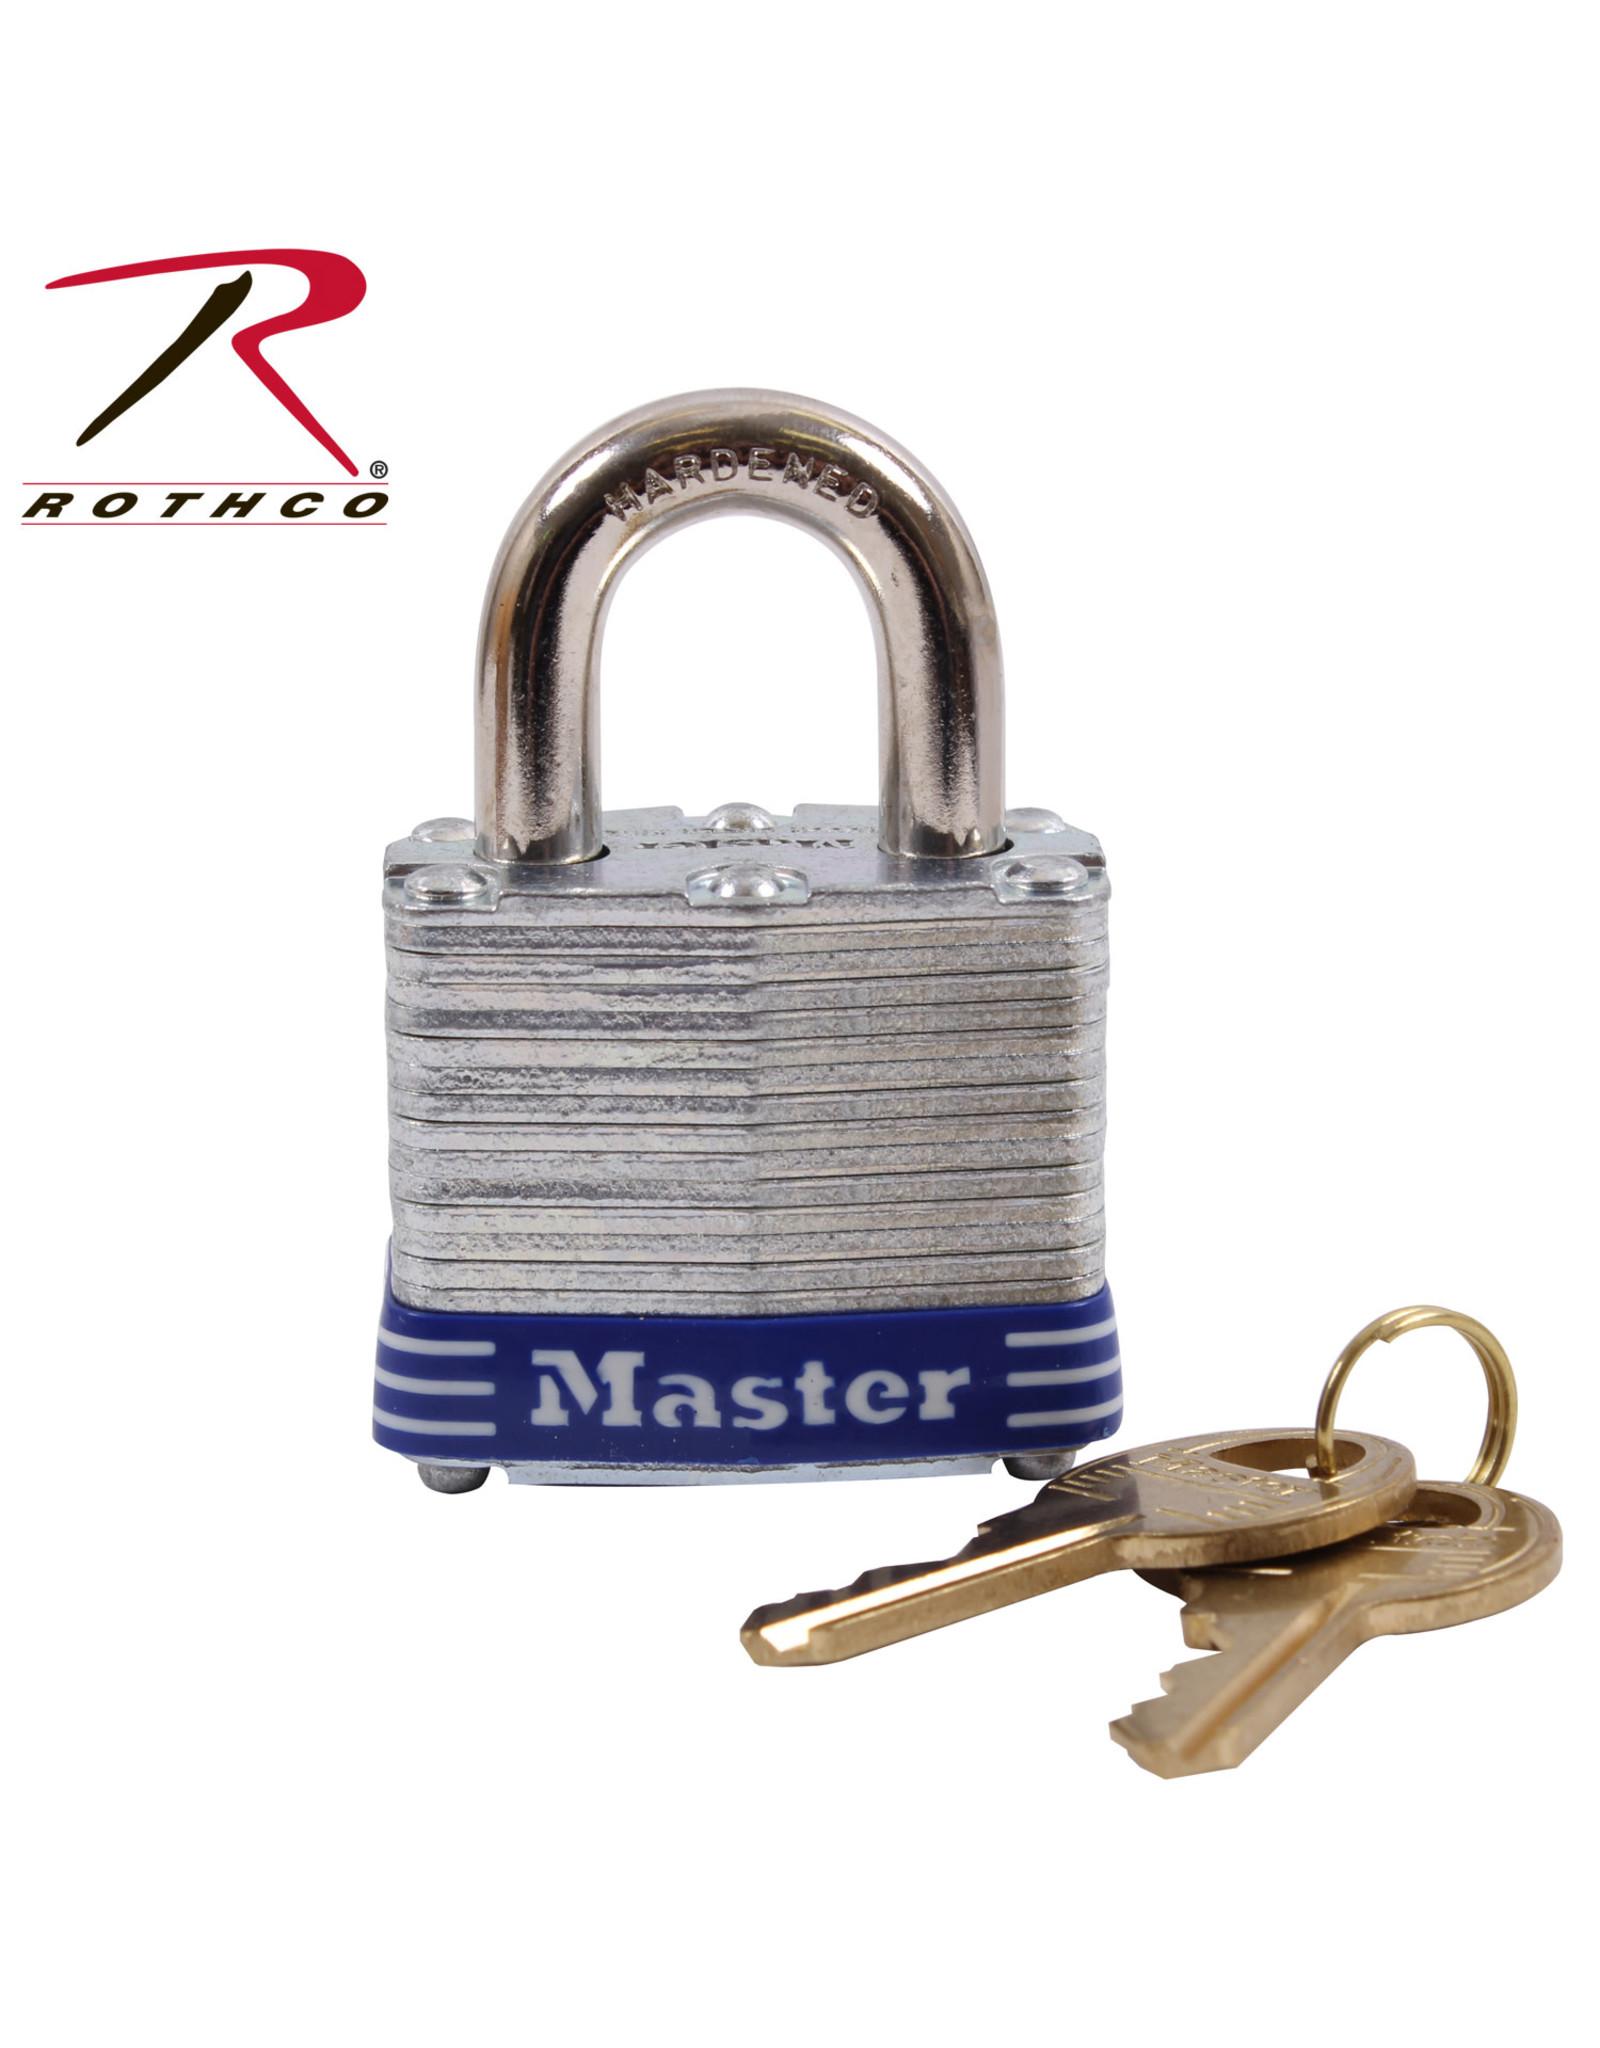 Master Cylinder Tumbler Lock - 3D